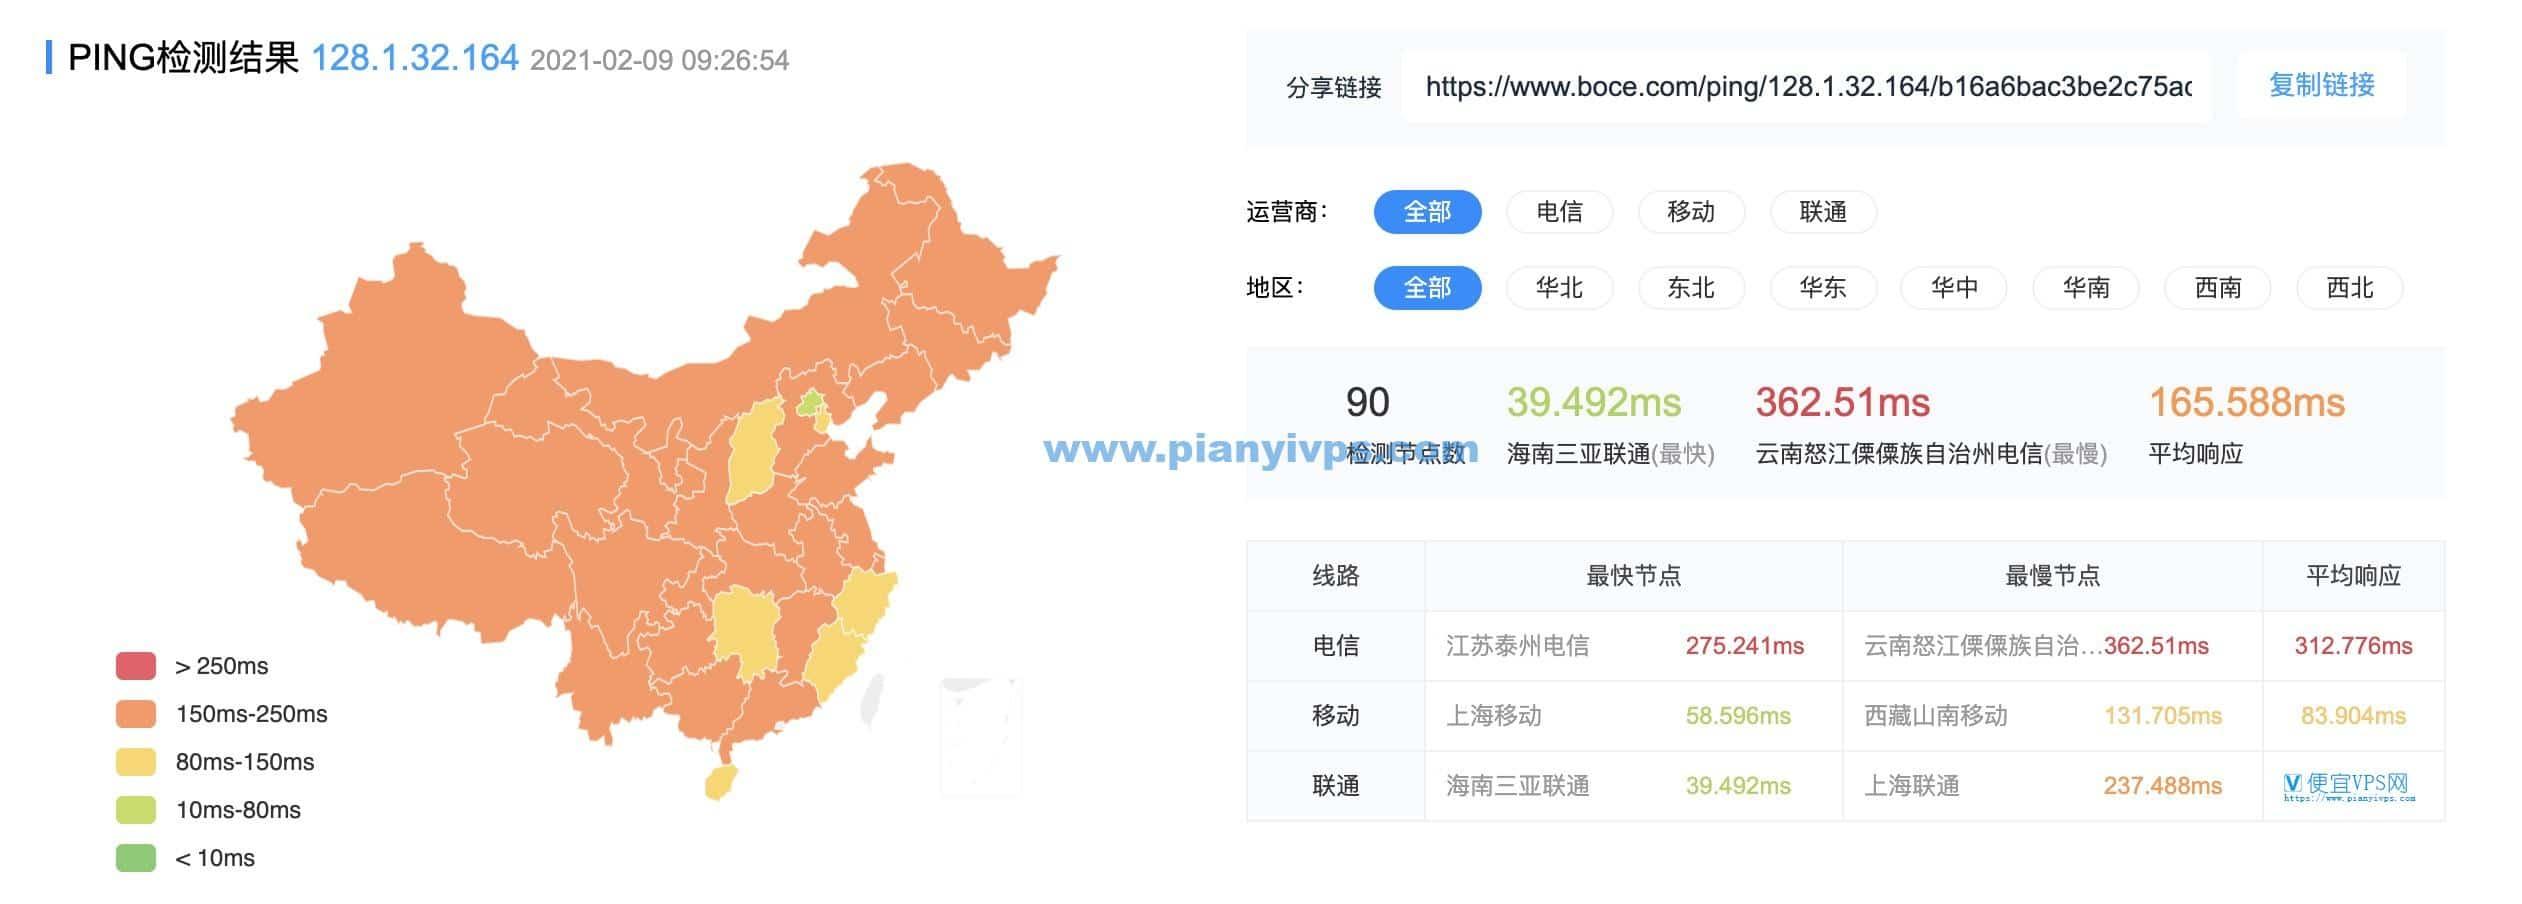 UCloud 台湾机房延迟